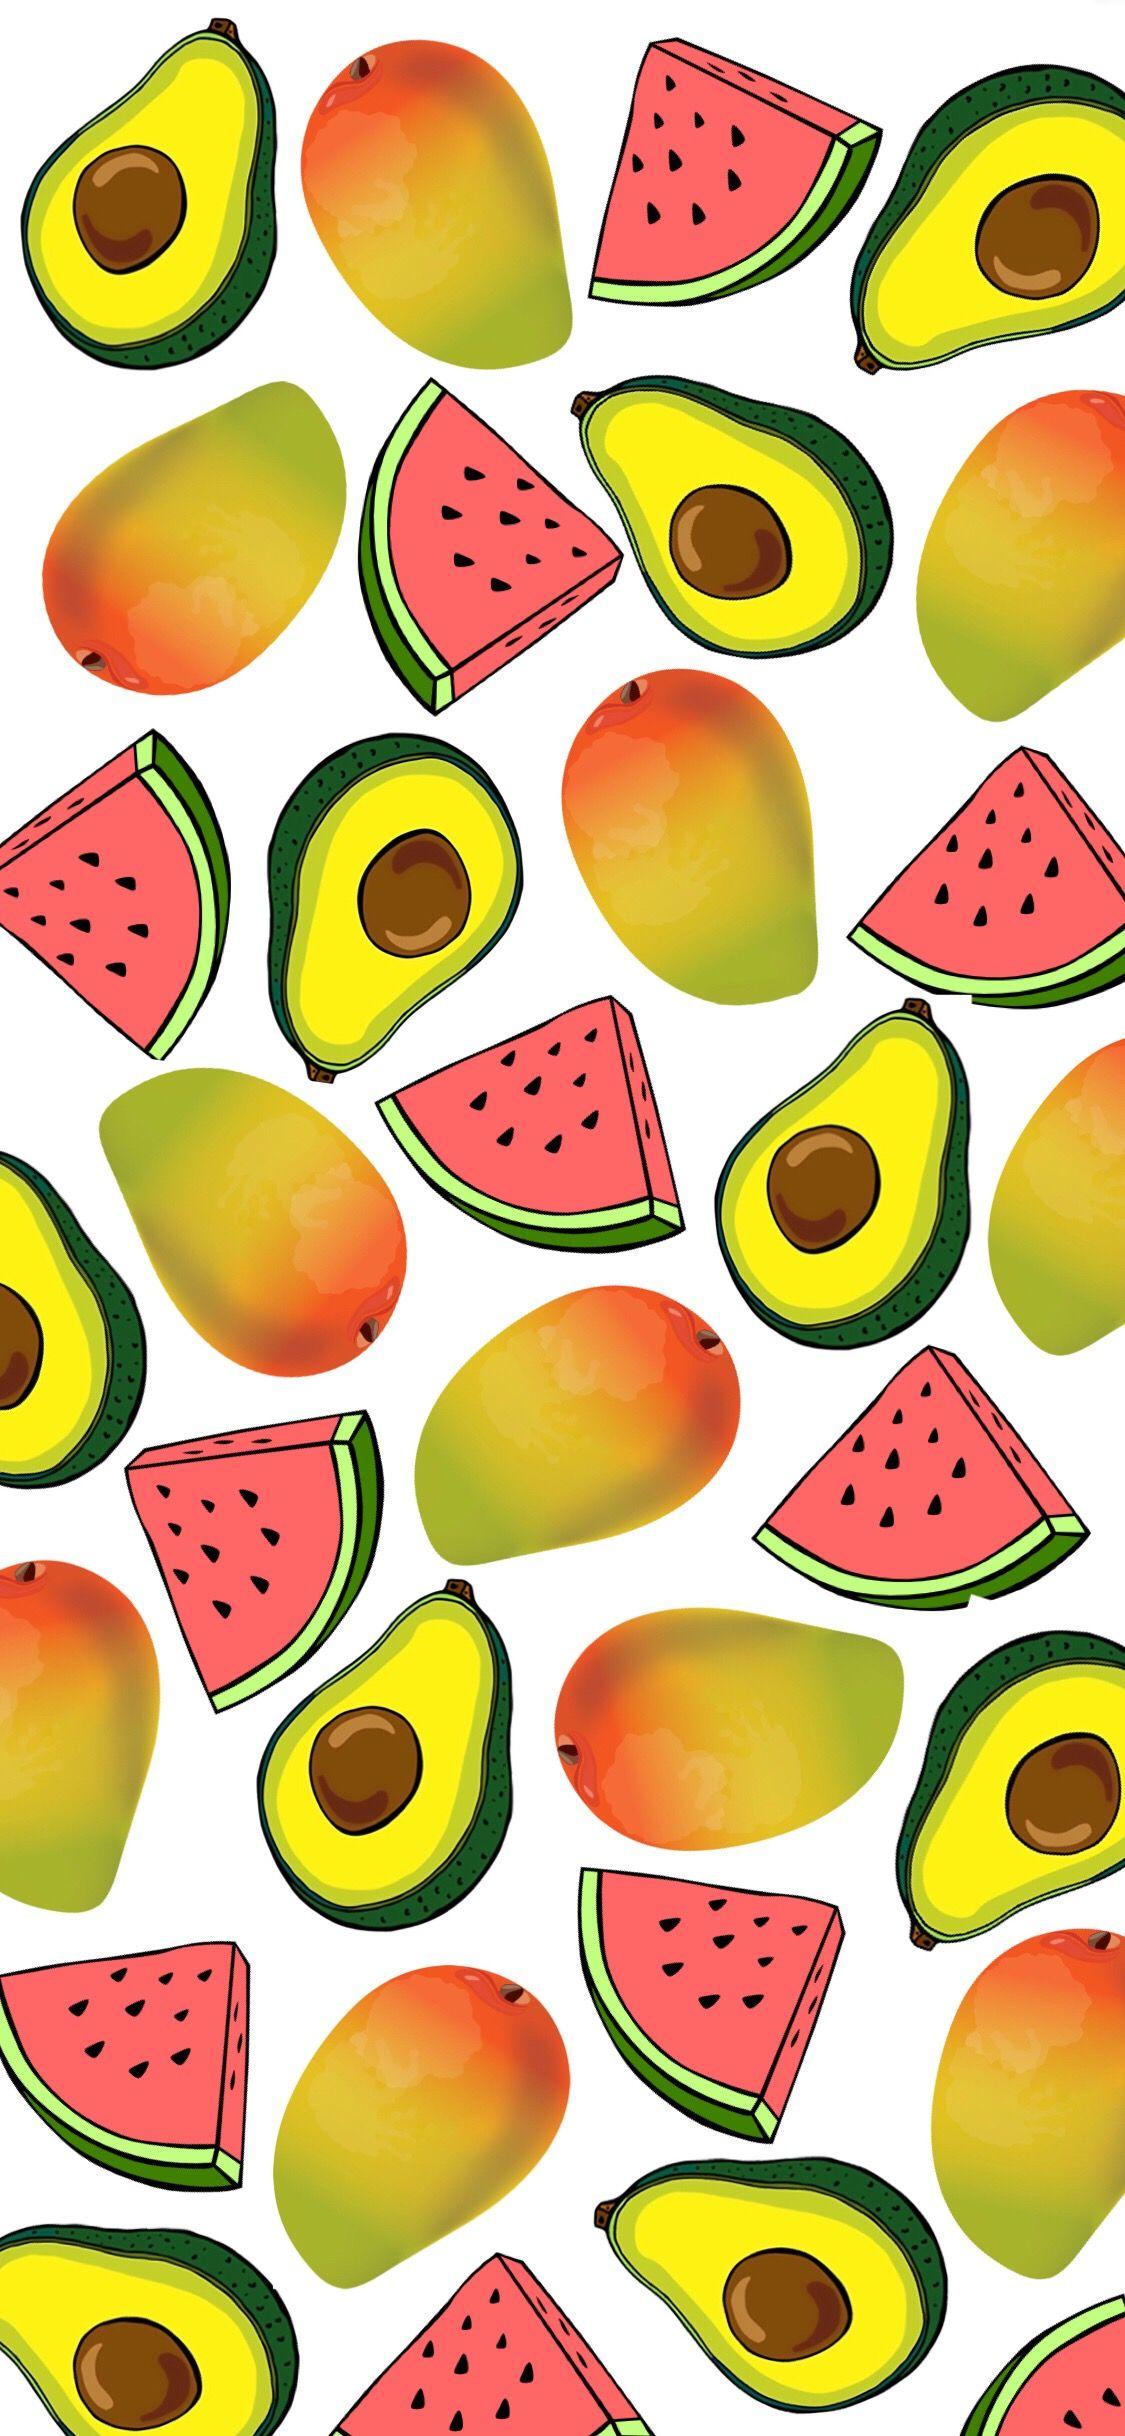 watermellon avocado mango iphone wallpaper background in 2019 1125x2436